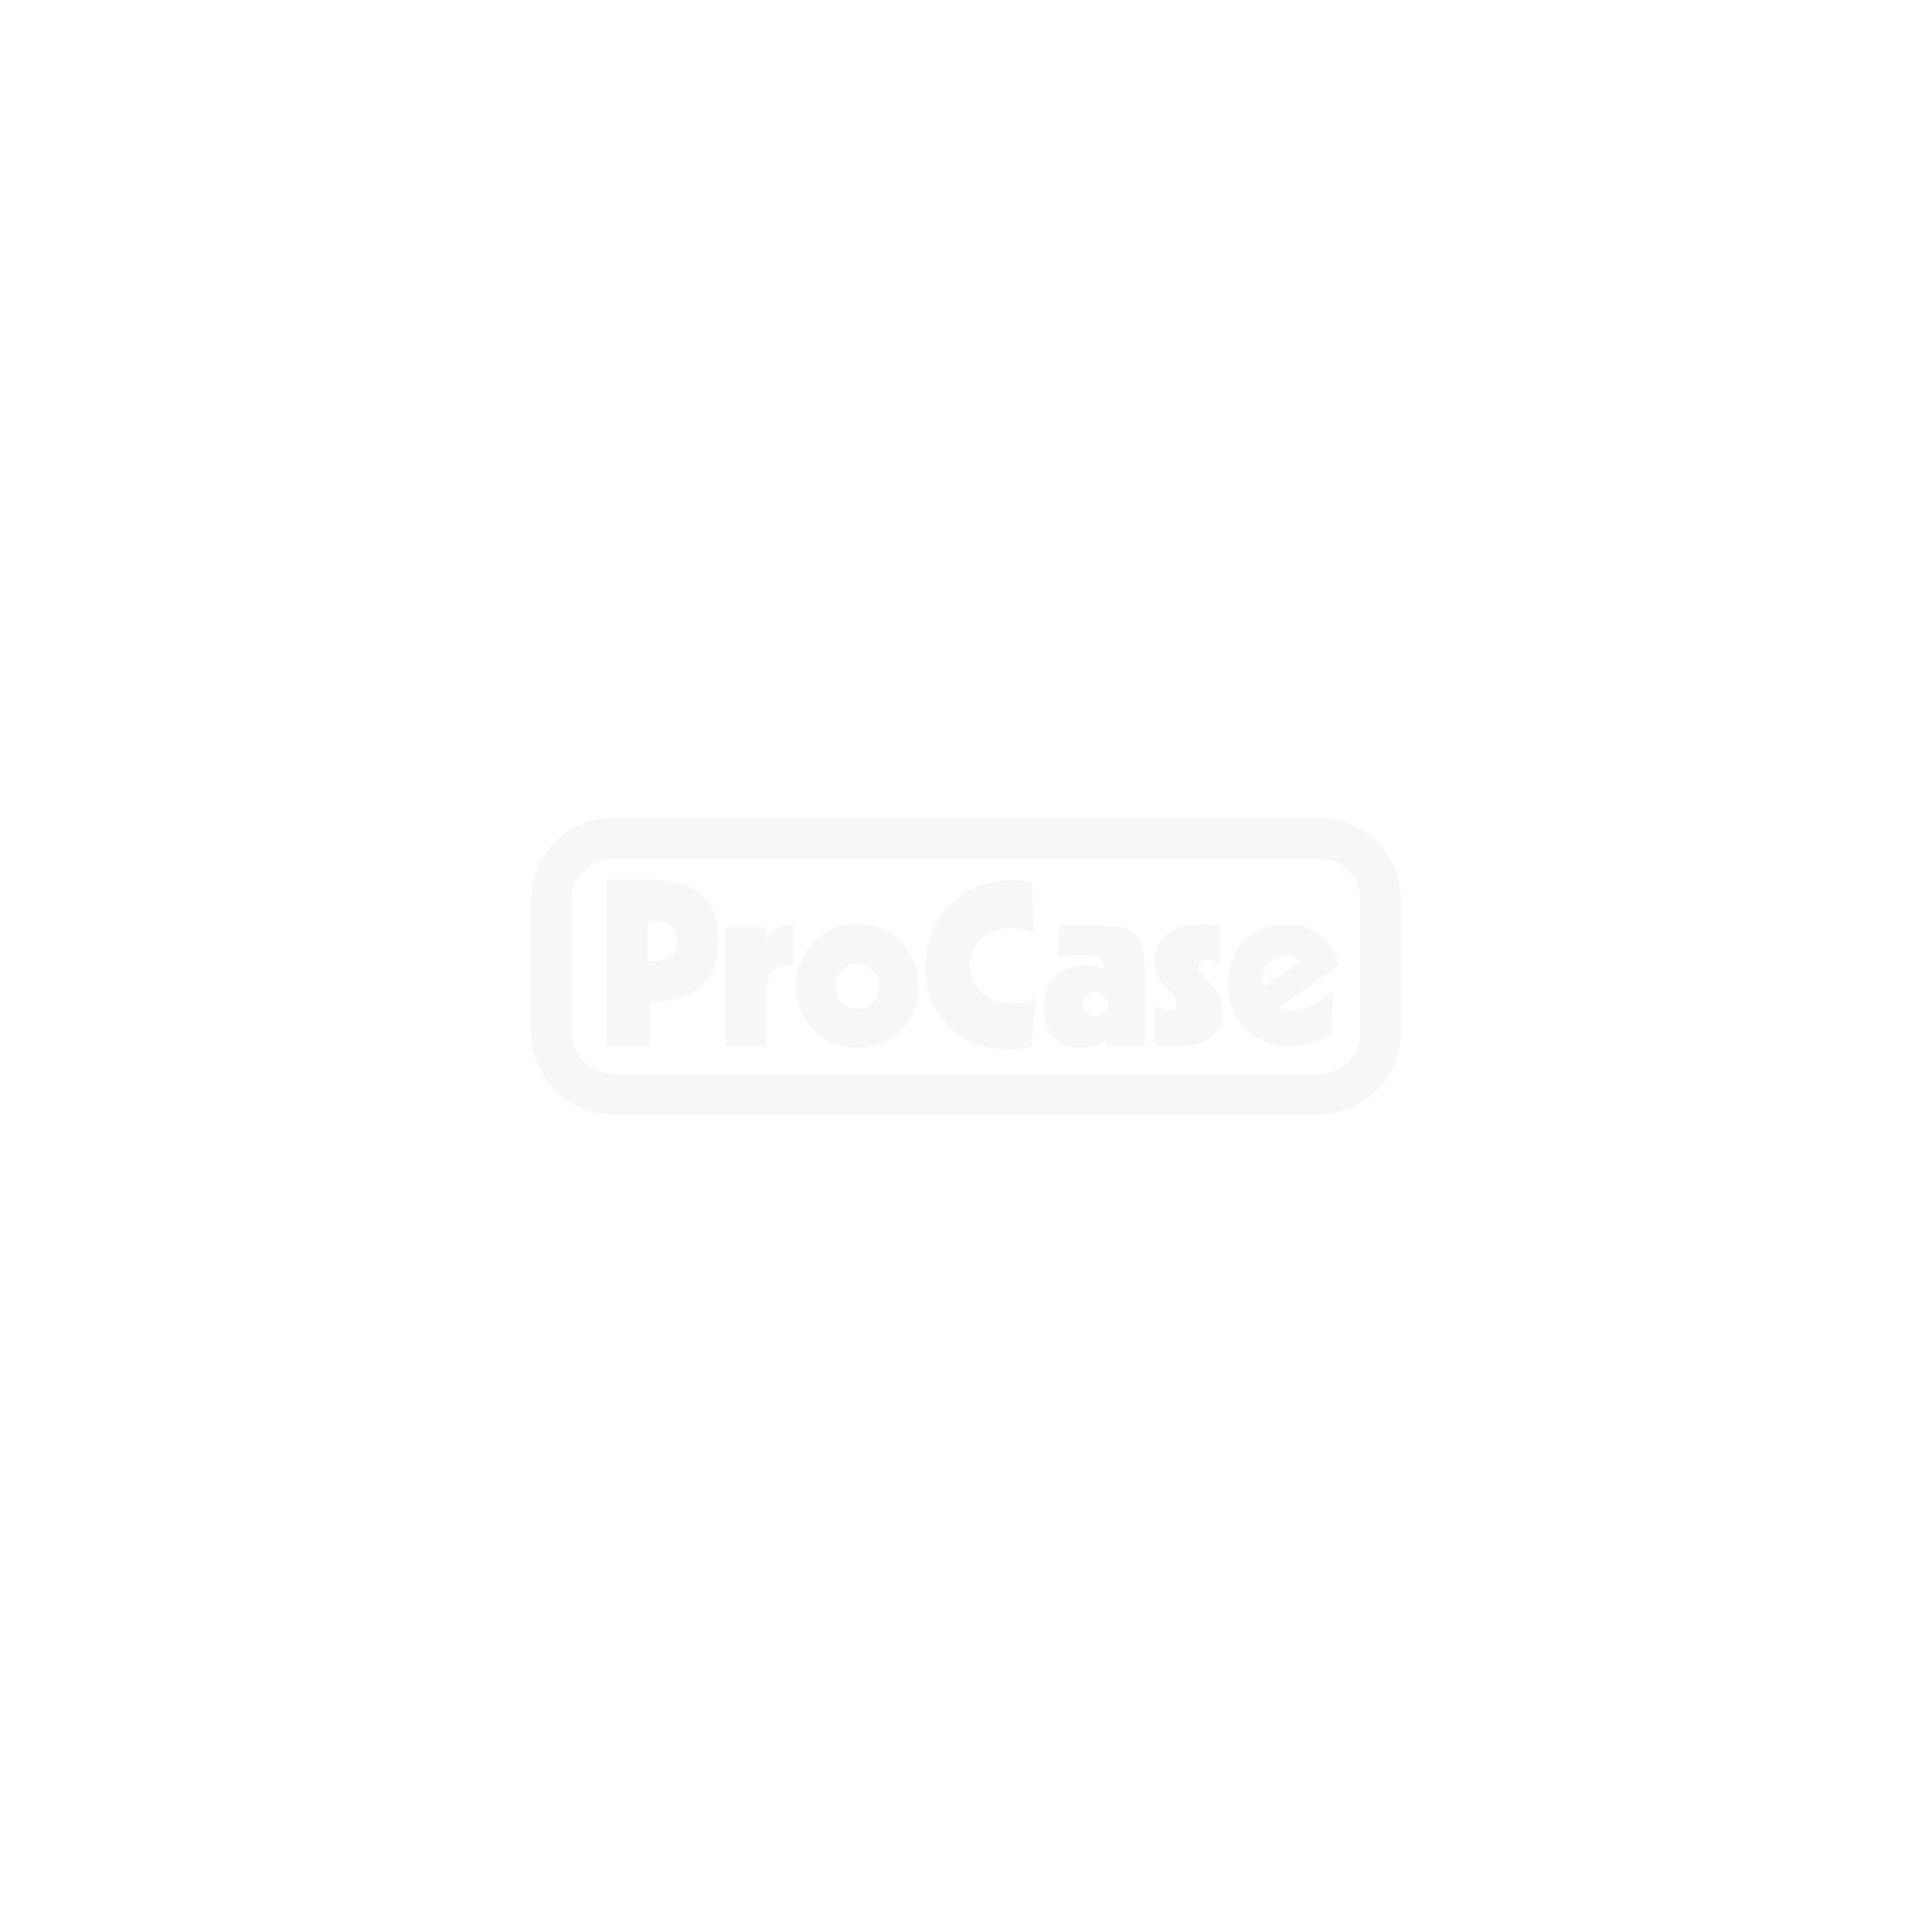 SKB 3i Koffer 1209-4B mit Rasterschaumstoff